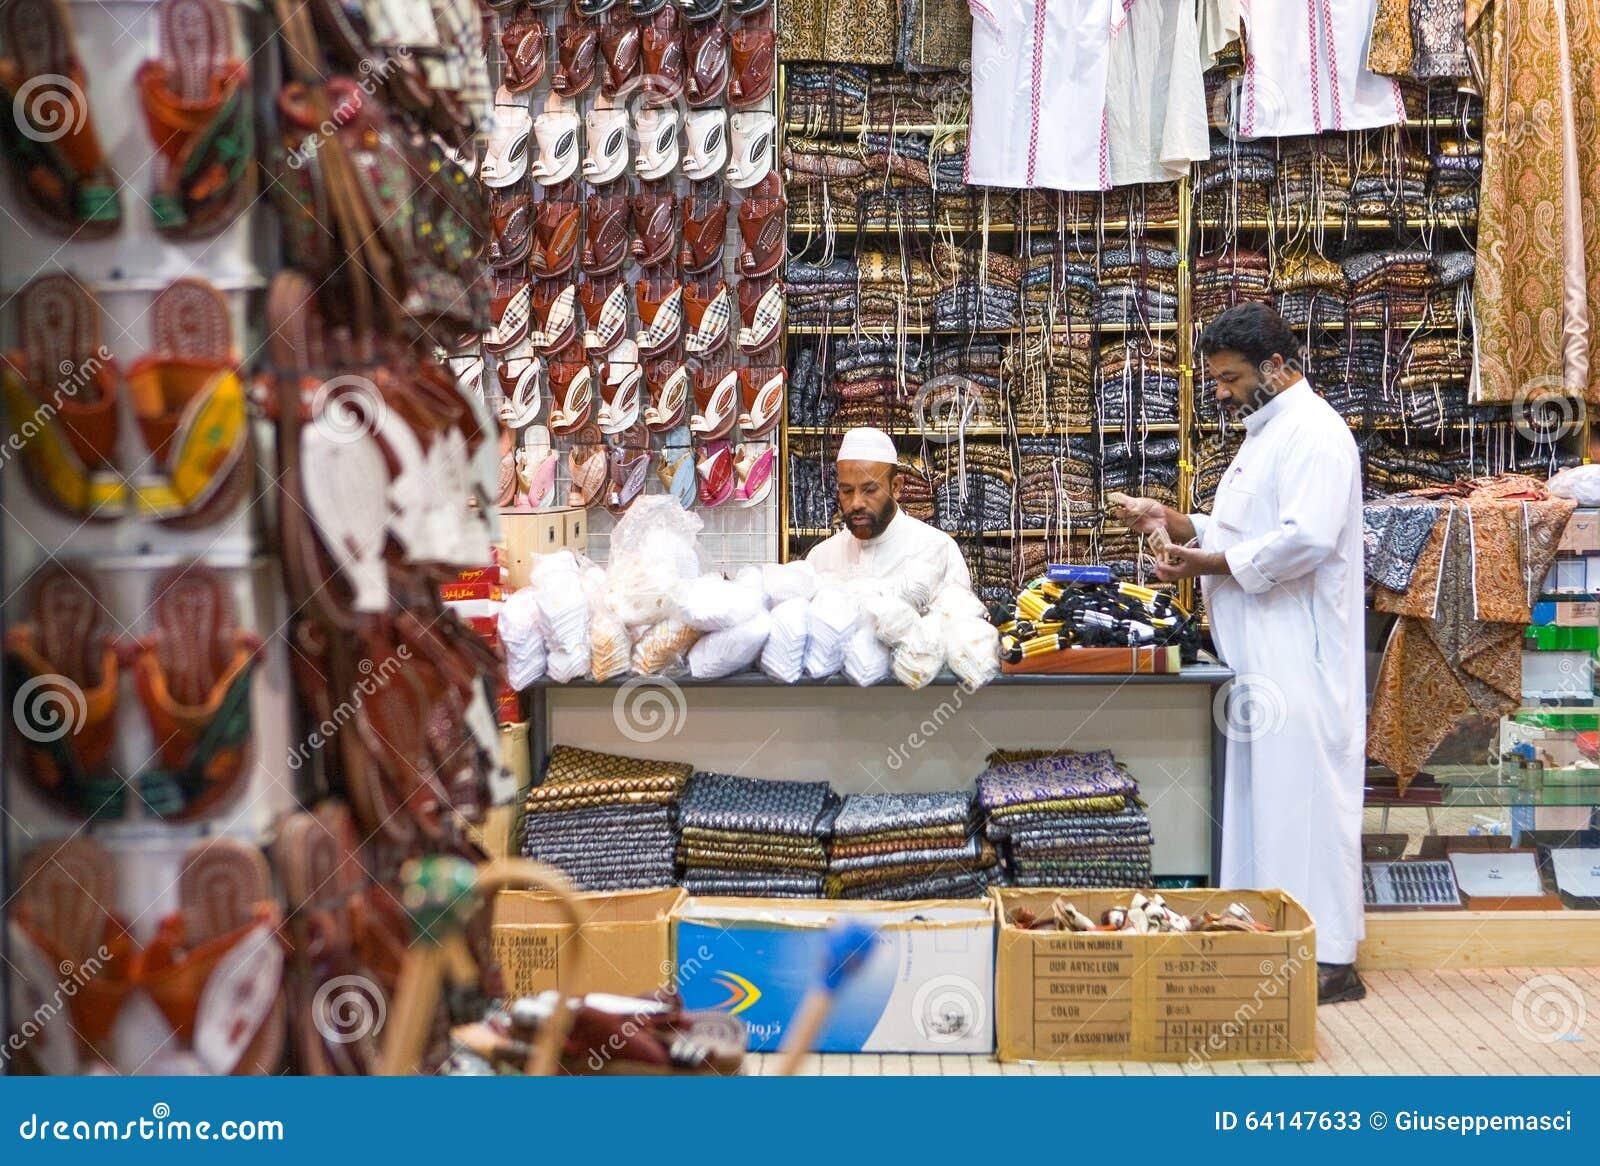 Saudi Arabia editorial stock photo  Image of shopkeeper